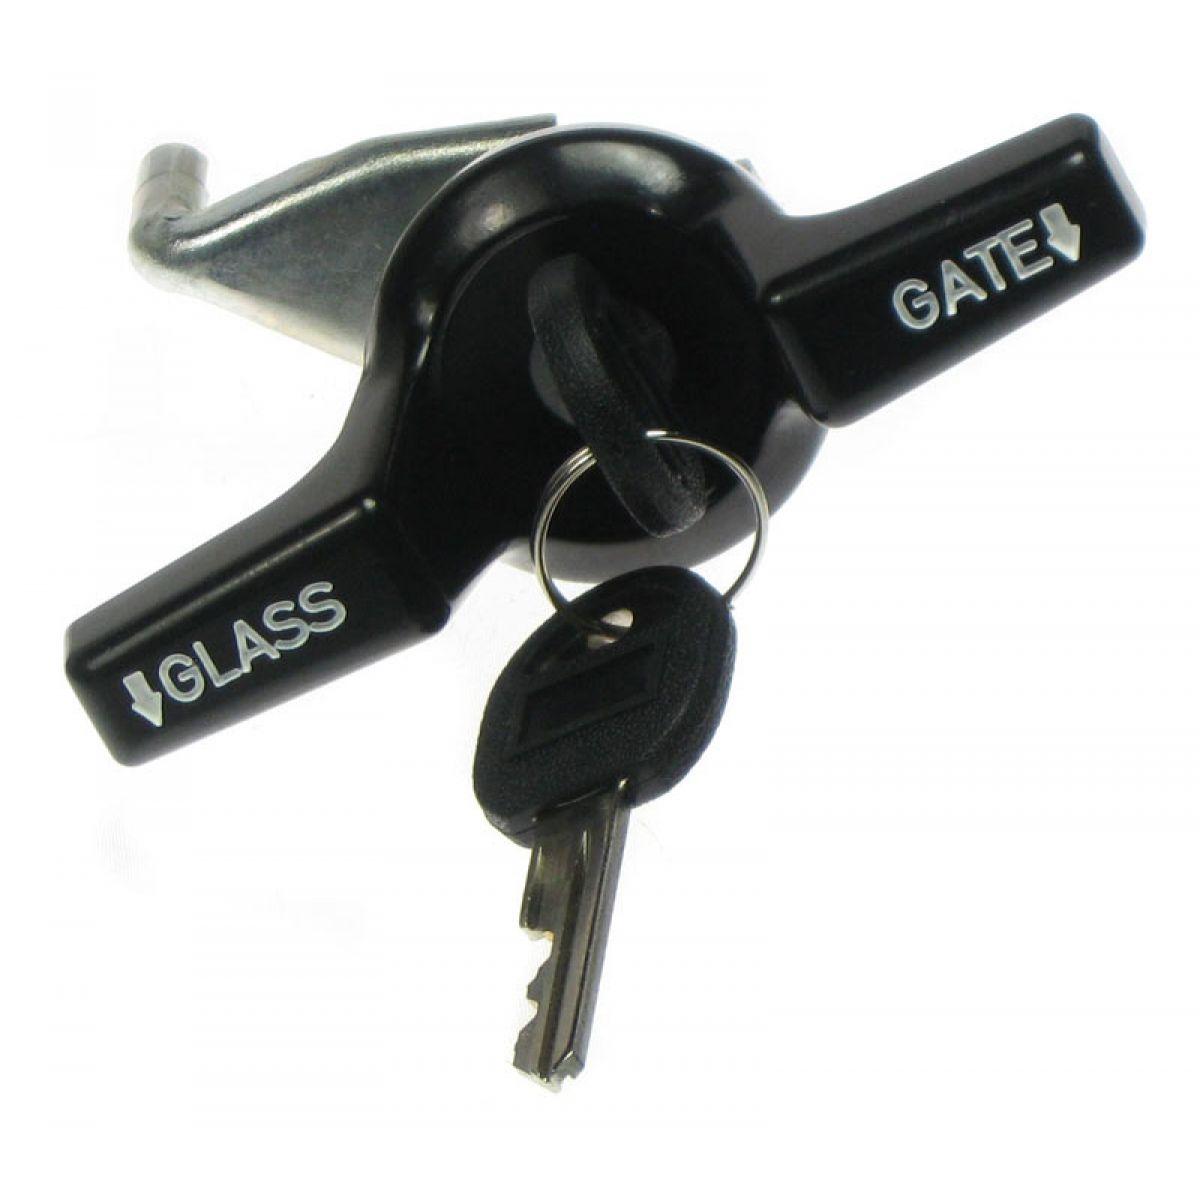 1993 Chevrolet Lumina Apv Interior: Tailgate Handle Lock W/White Lettering W/2 Keys For Chevy